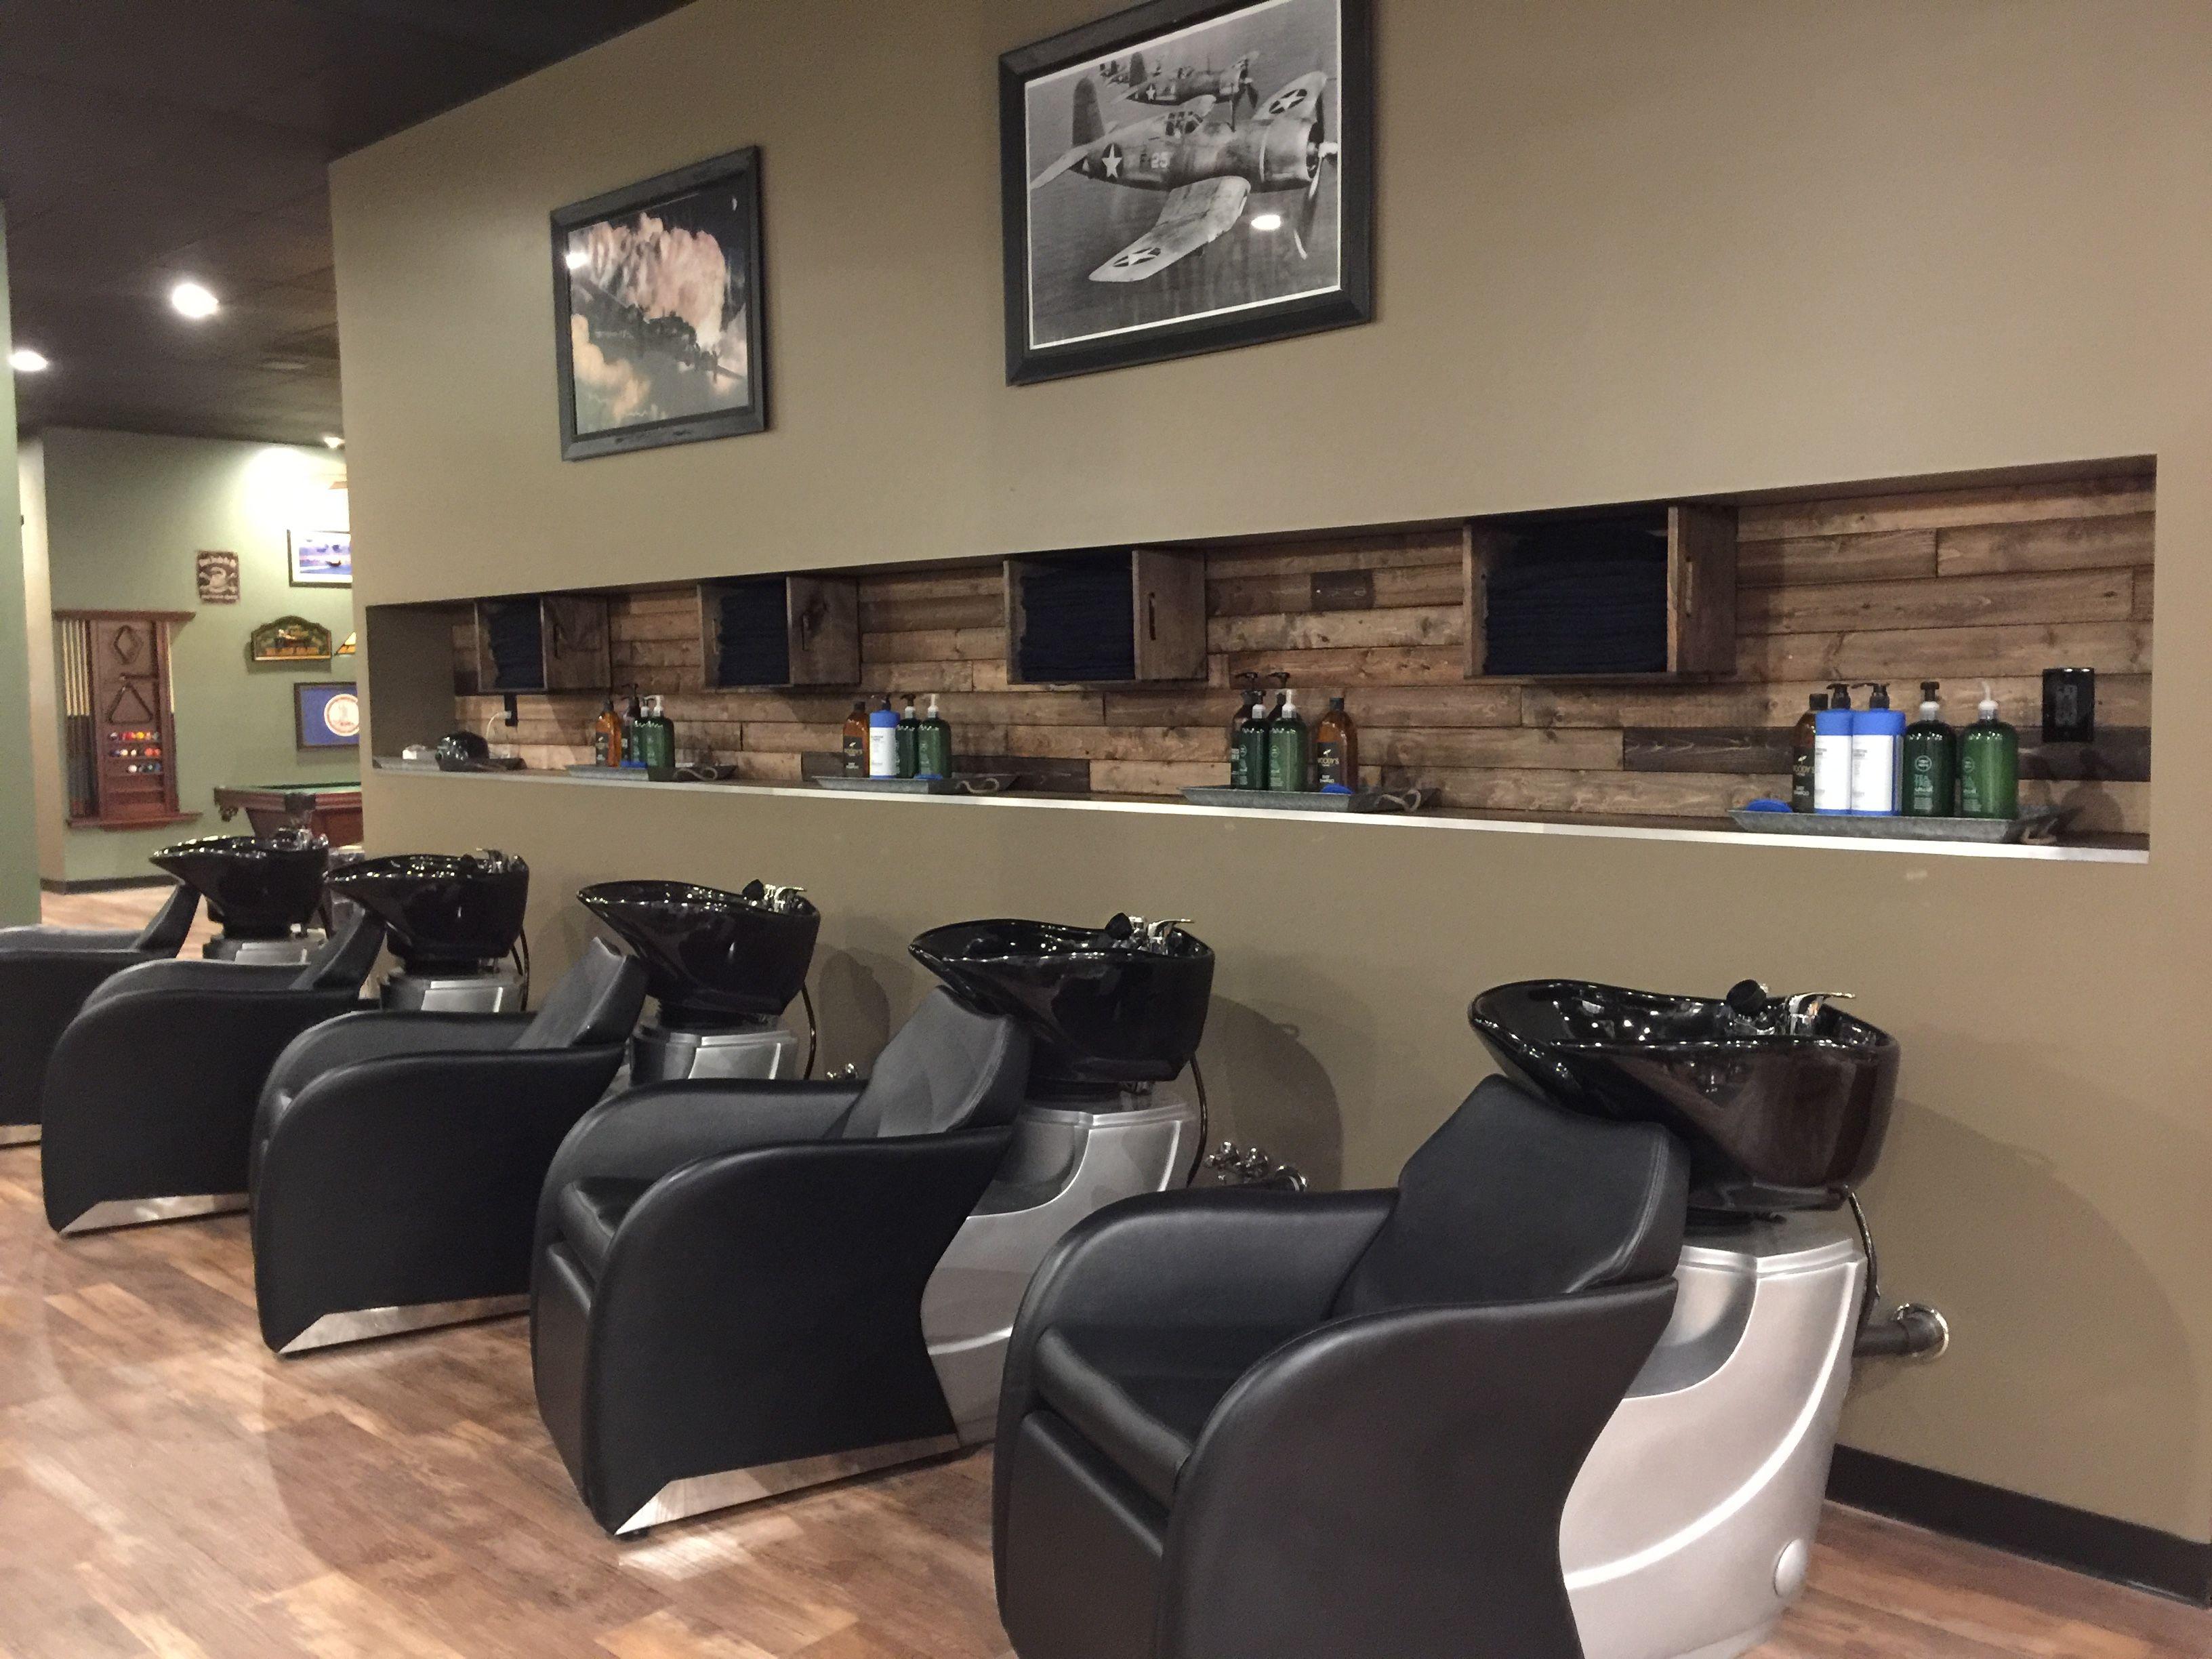 Barber Shop Barber Chairs Salon Shampoo Bowls Spa Room Decor